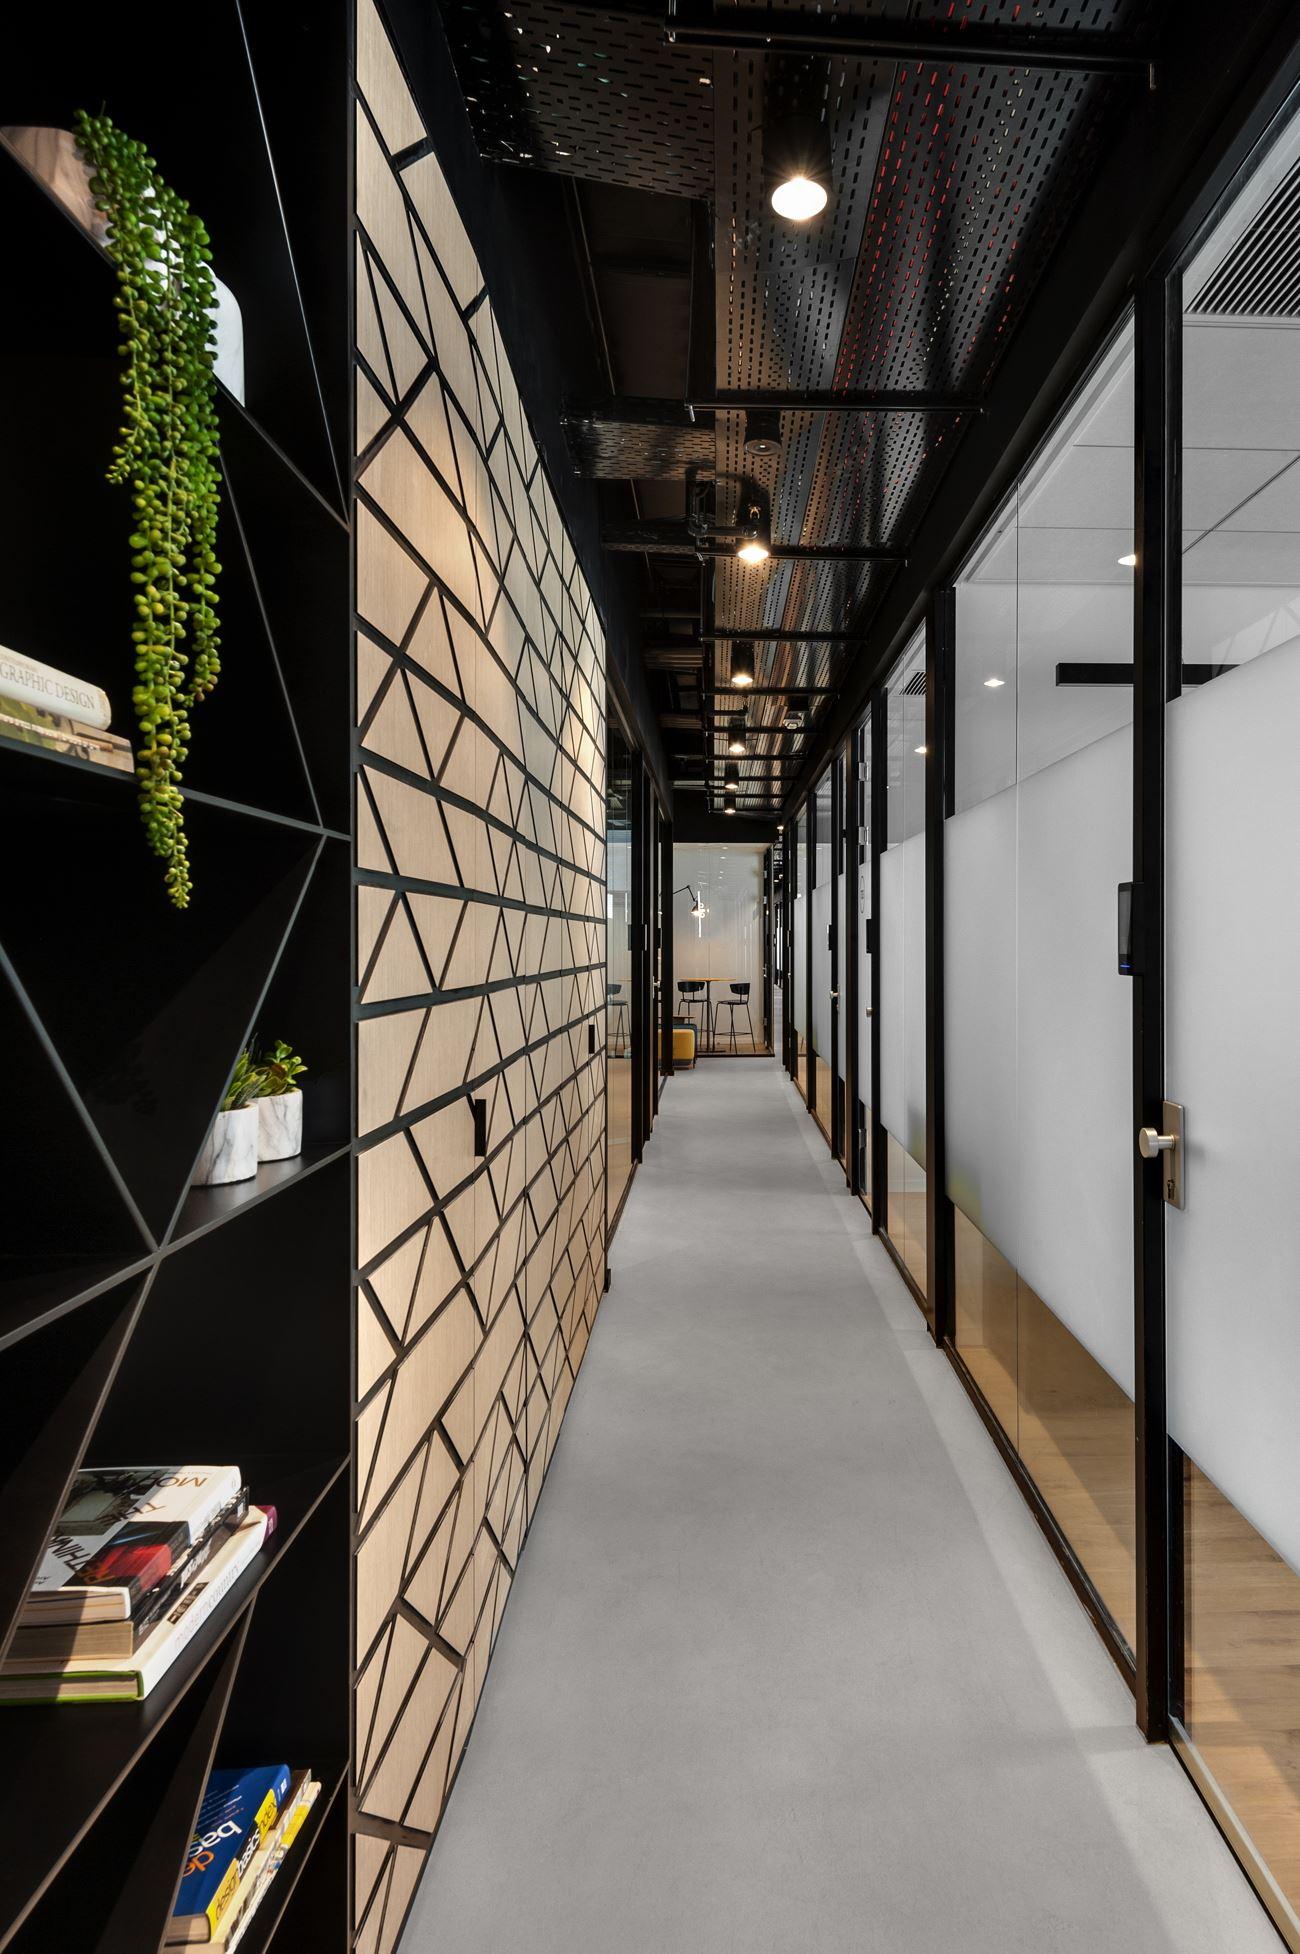 Innovation Offices עיצוב תאורה בתקרת המסדרון בעיצוב של קמחי דורי